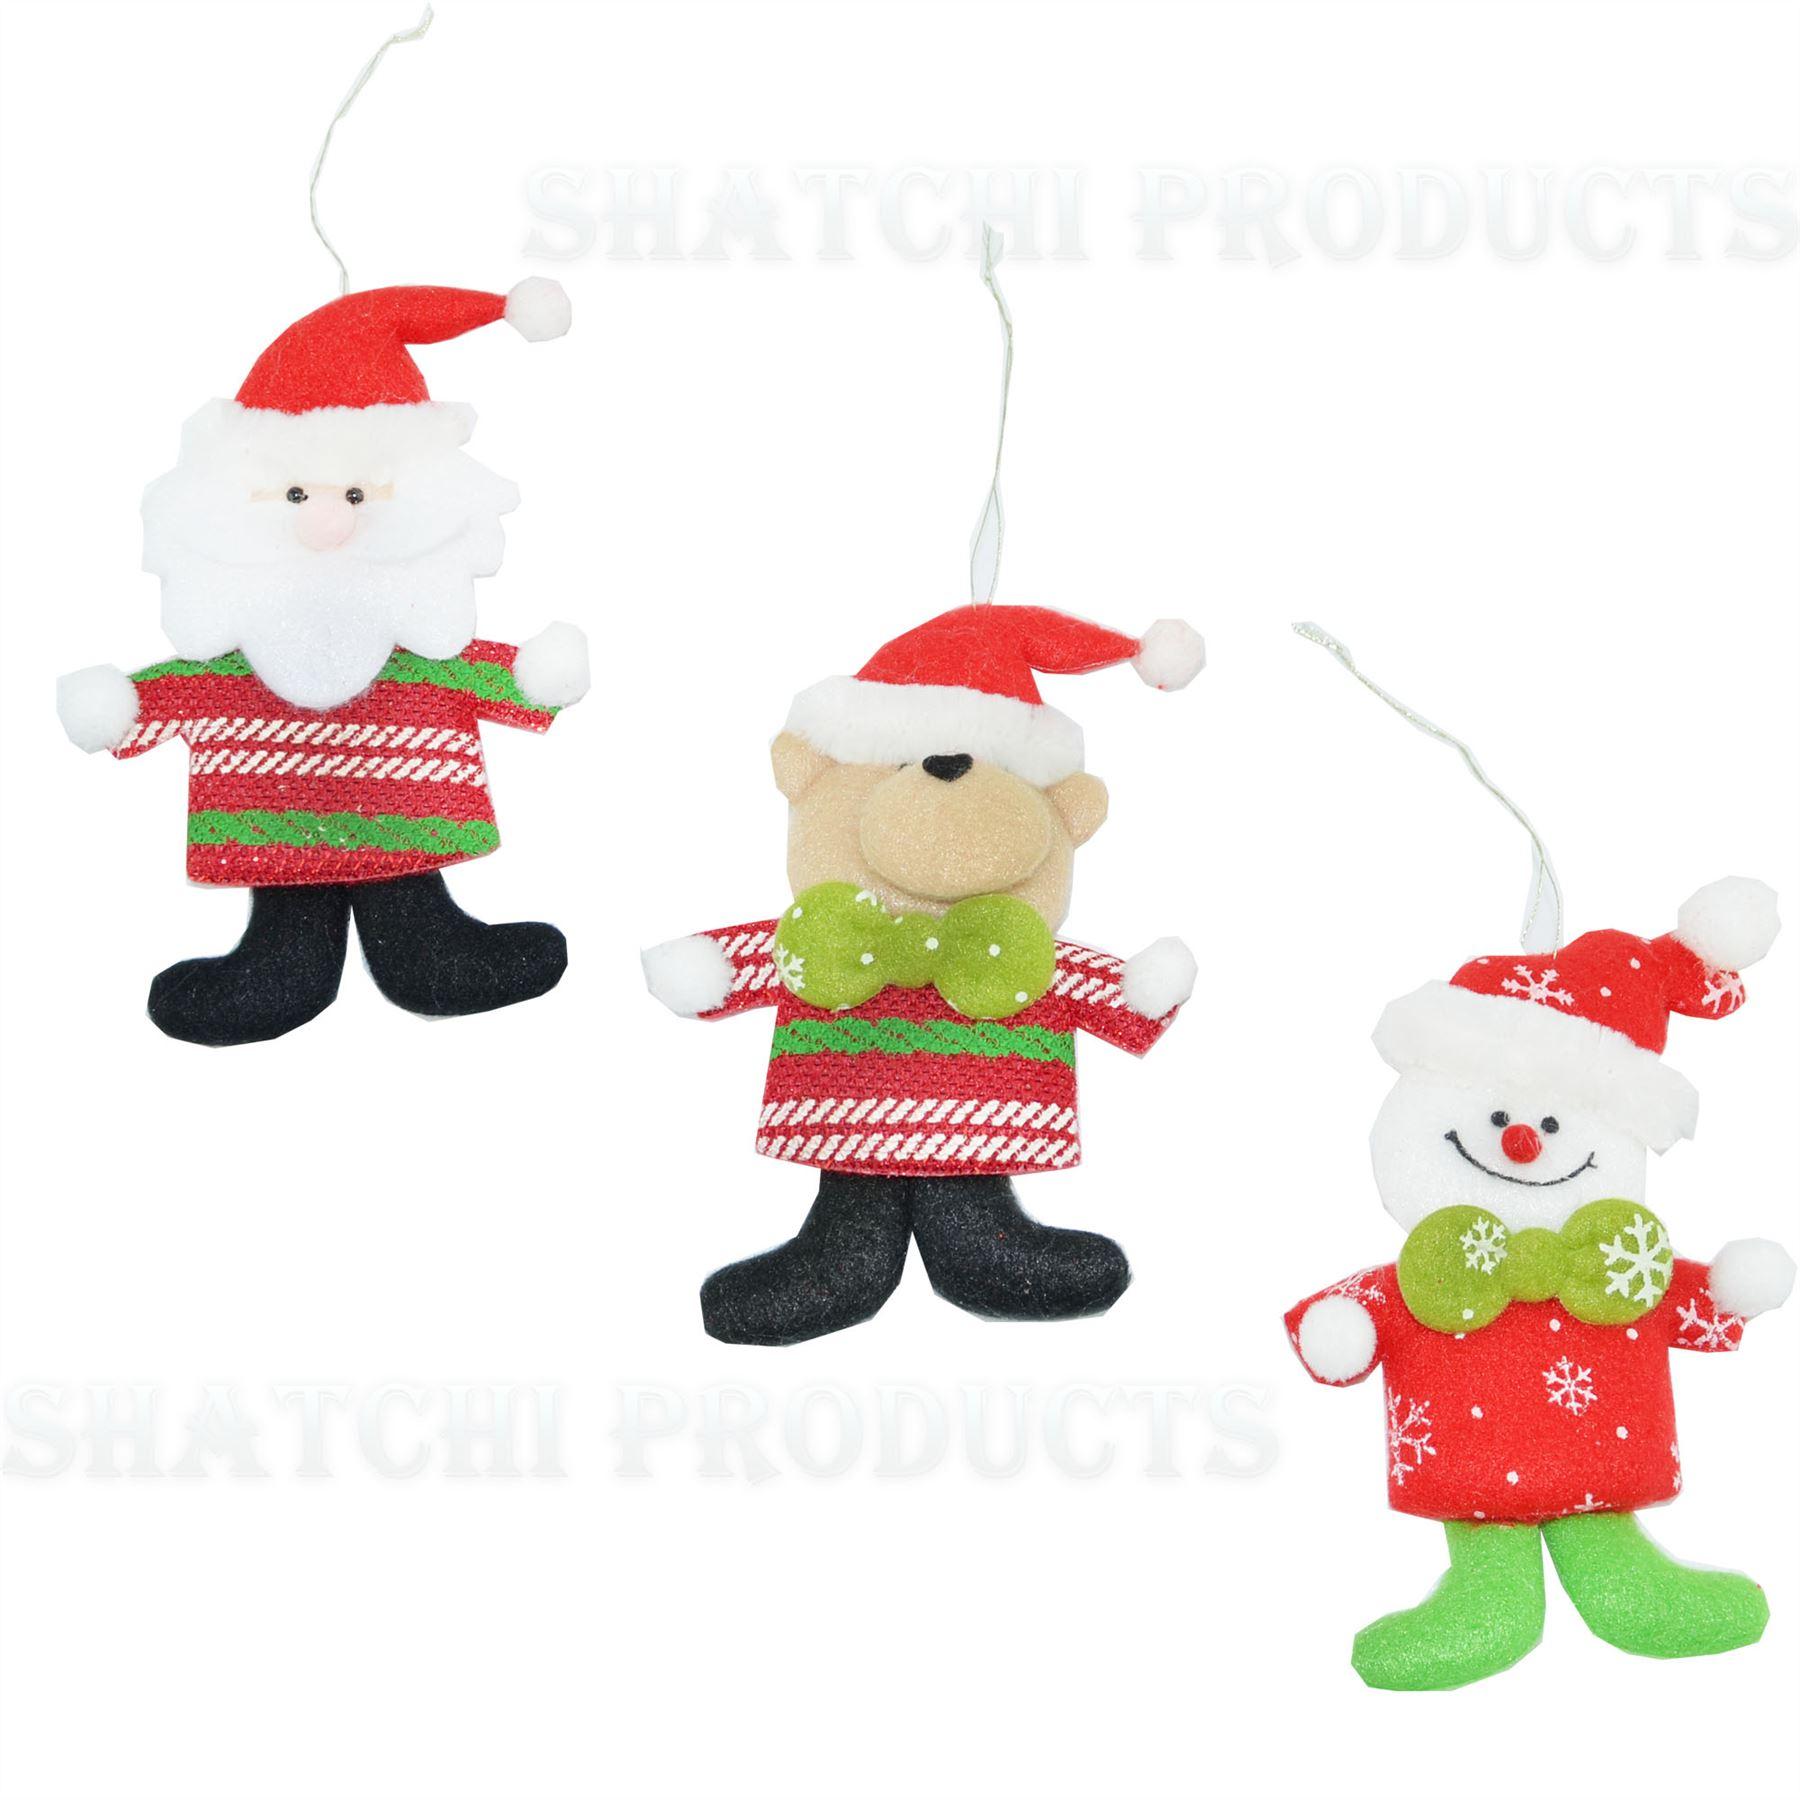 Christmas-Tree-Hanging-Decorations-Glitter-Snowman-Xmas-Beads-Chain-Garland thumbnail 19